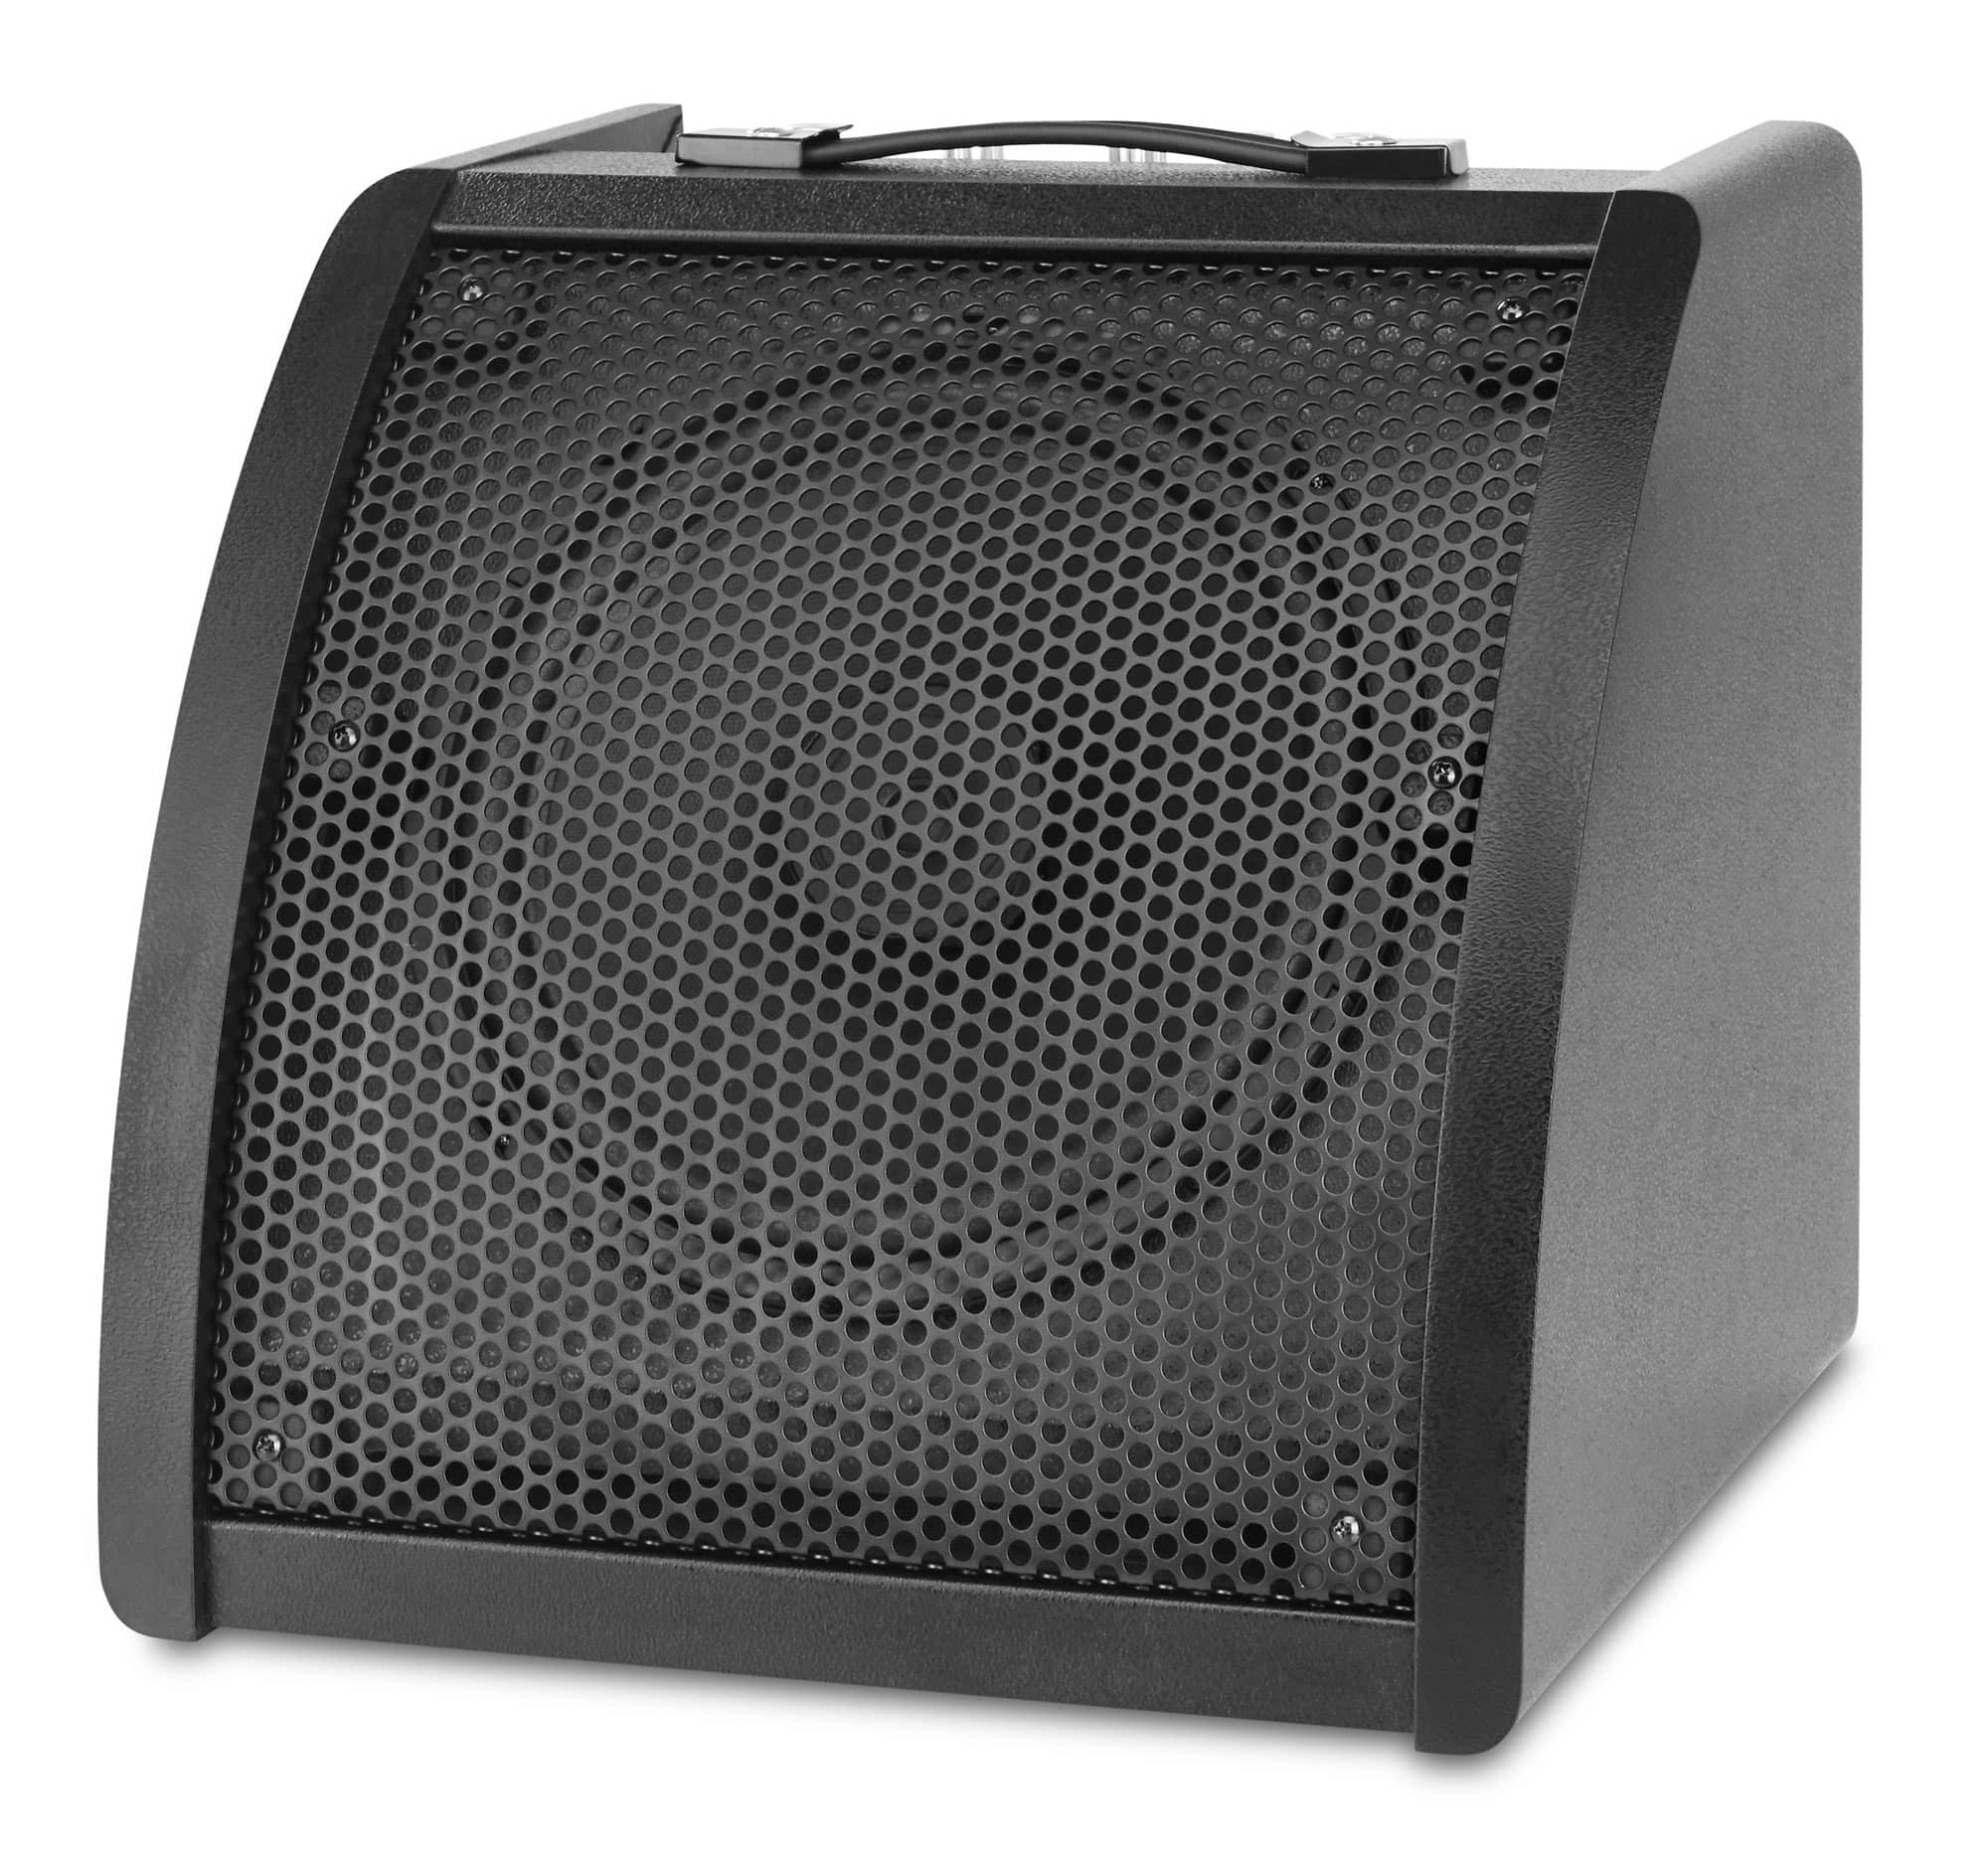 Paendstufen - Classic Cantabile AP 30 Aktiv Monitor Retoure (Verpackungsschaden) - Onlineshop Musikhaus Kirstein